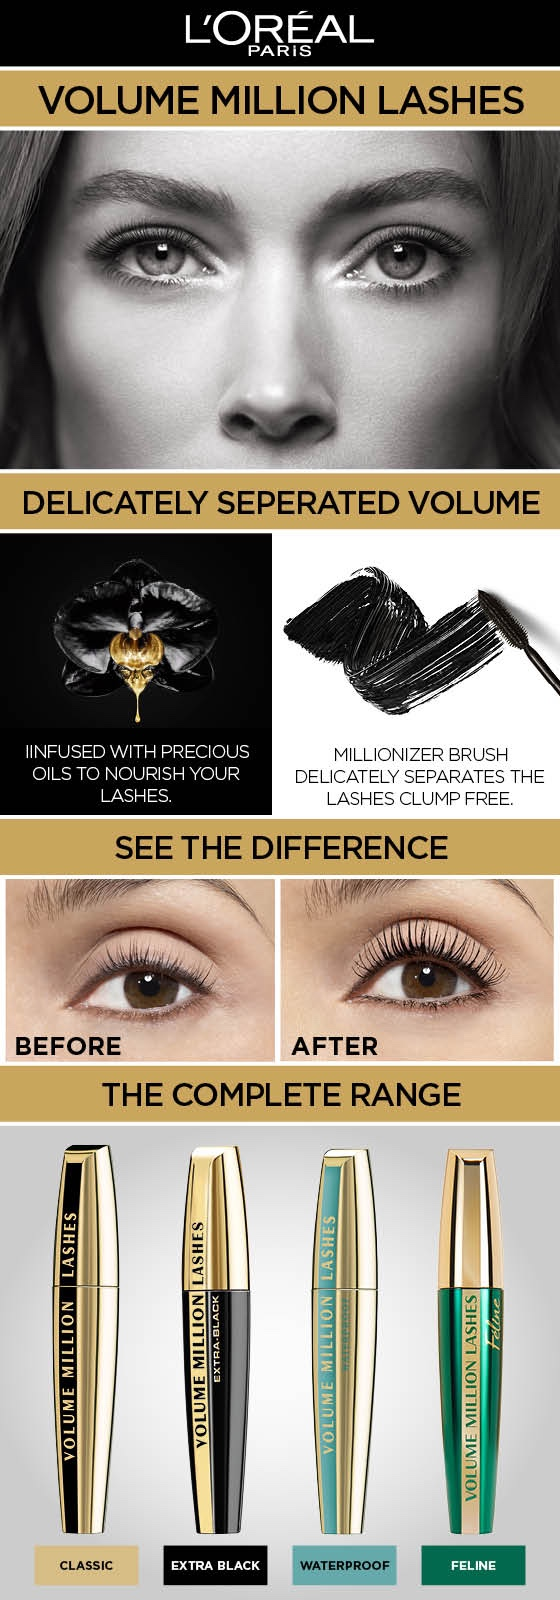 74cddc2406e Buy L'Oreal Volume Million Lashes Mascara Black Online at Chemist ...